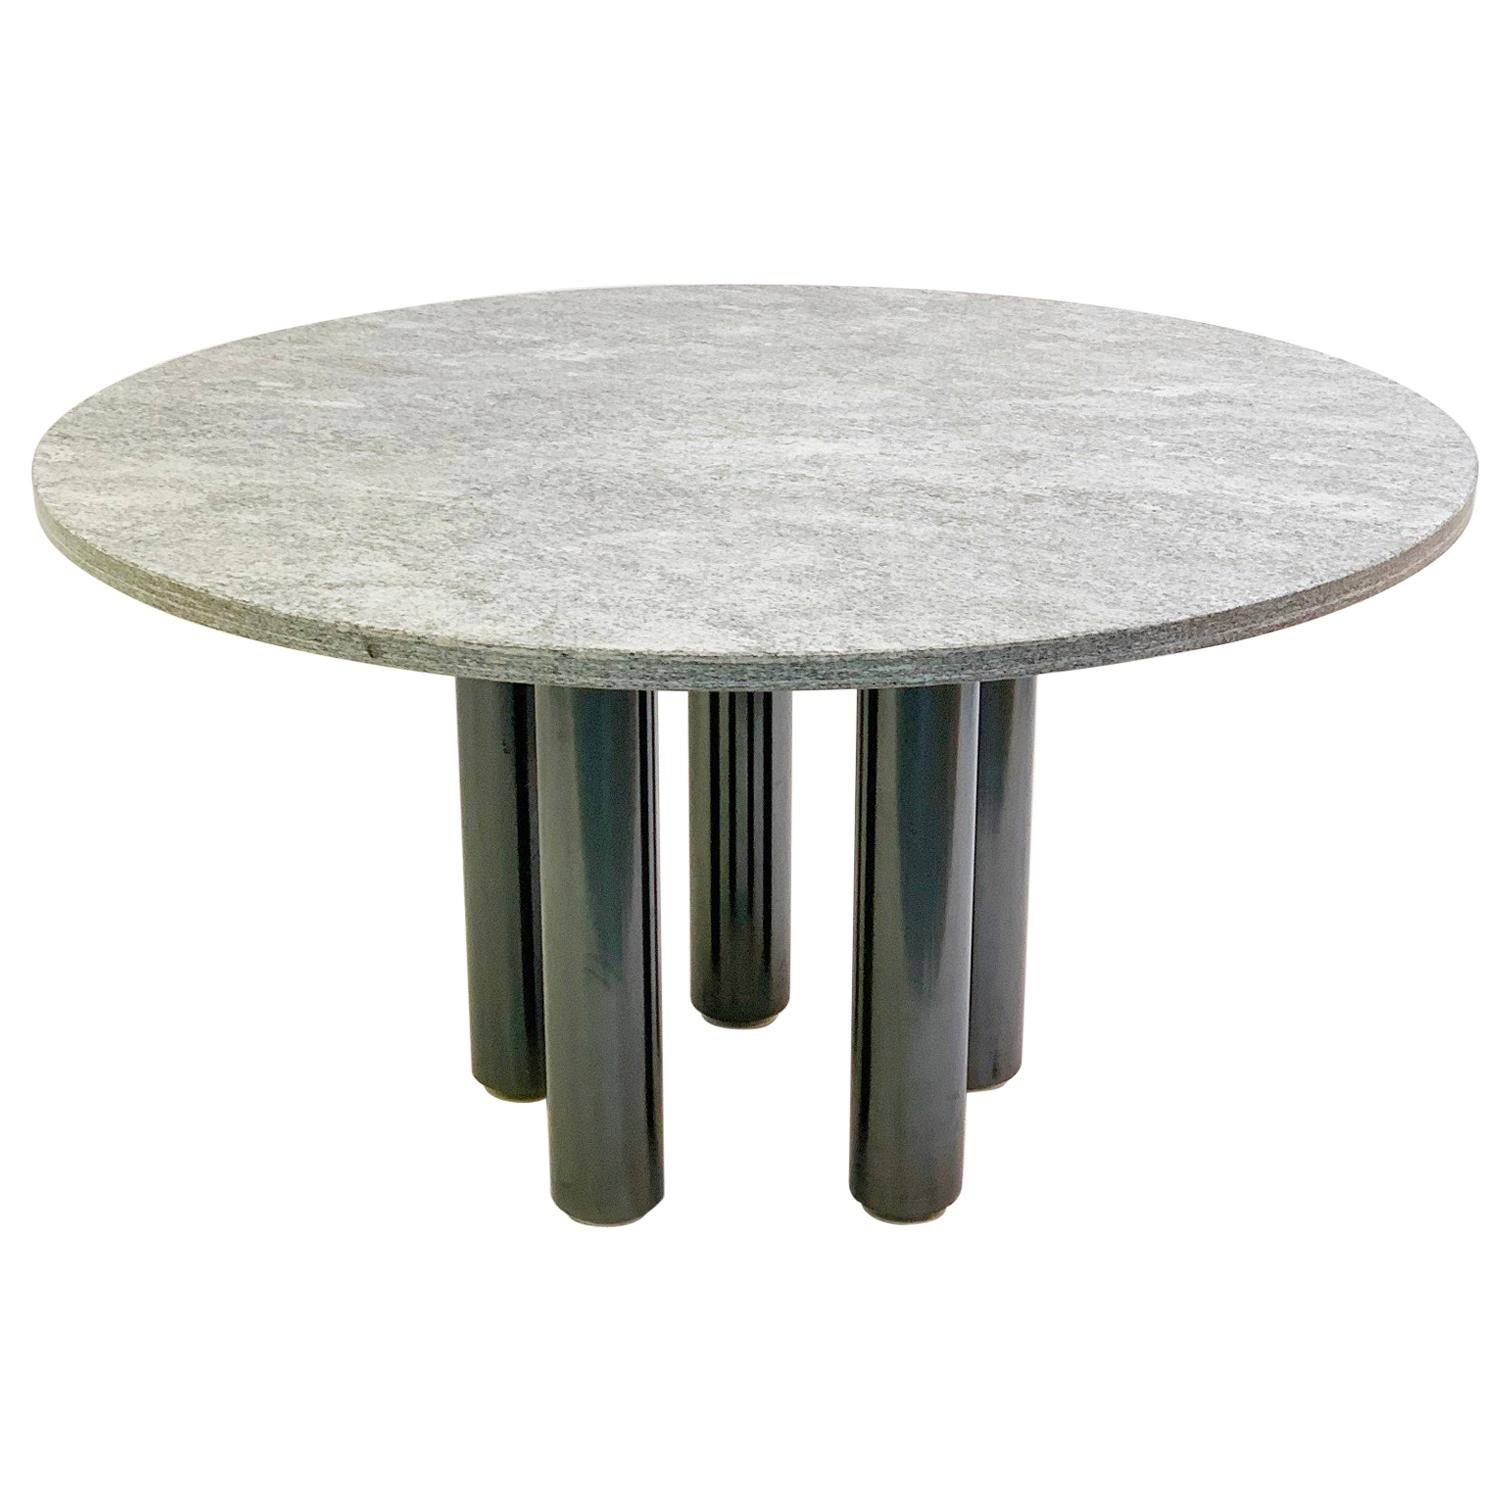 Dining Table by Marco Zanuso for Zanotta, Italy, 1970s